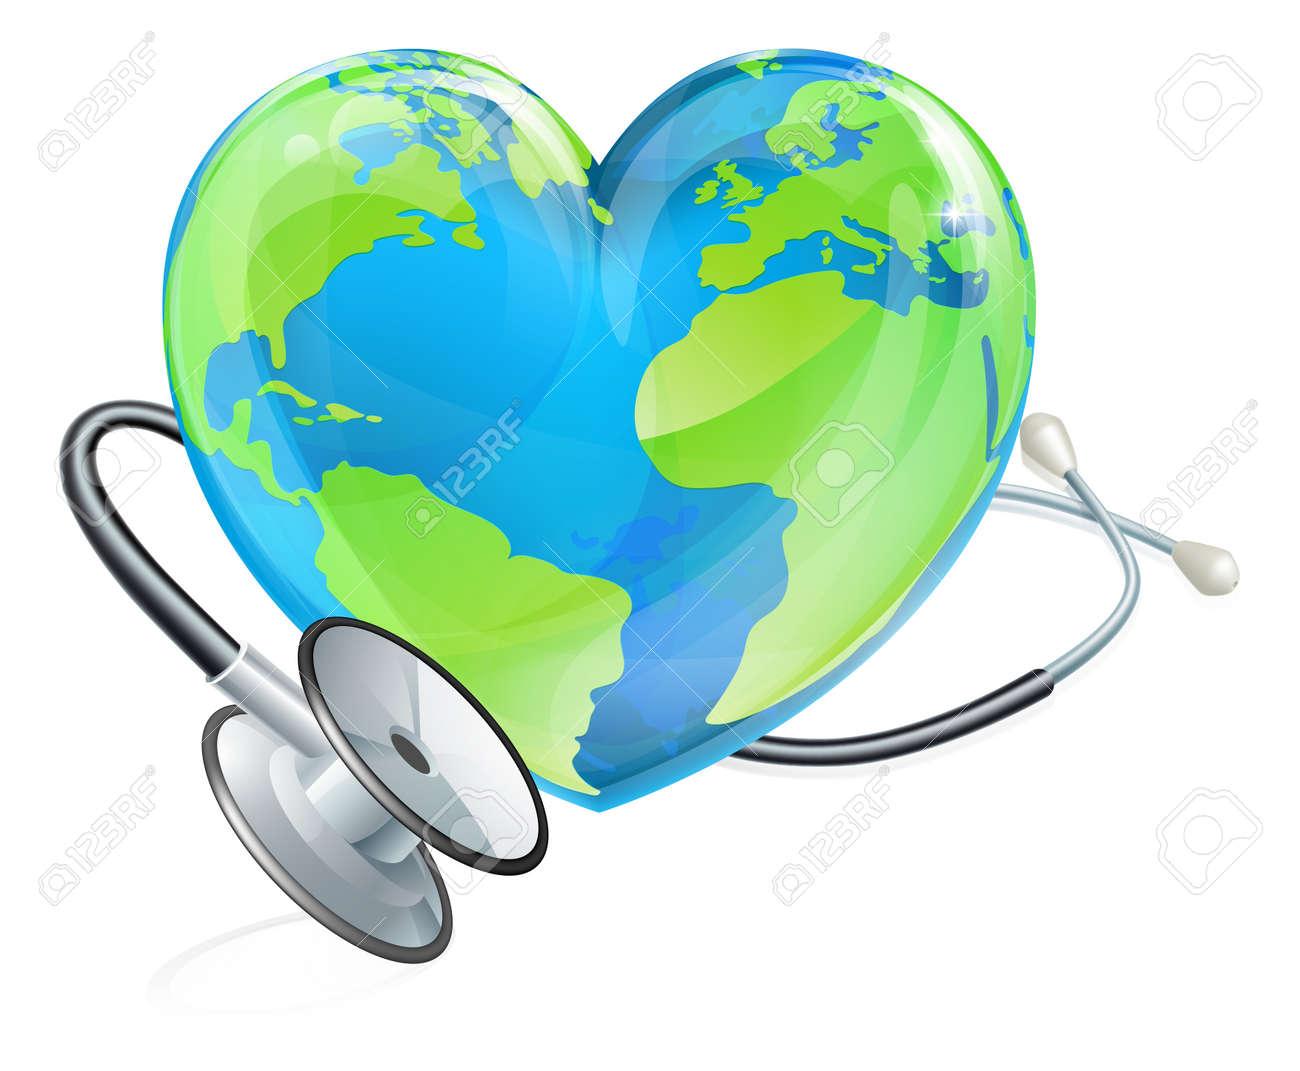 Health Concept Stethoscope Heart Earth World Globe - 123898364